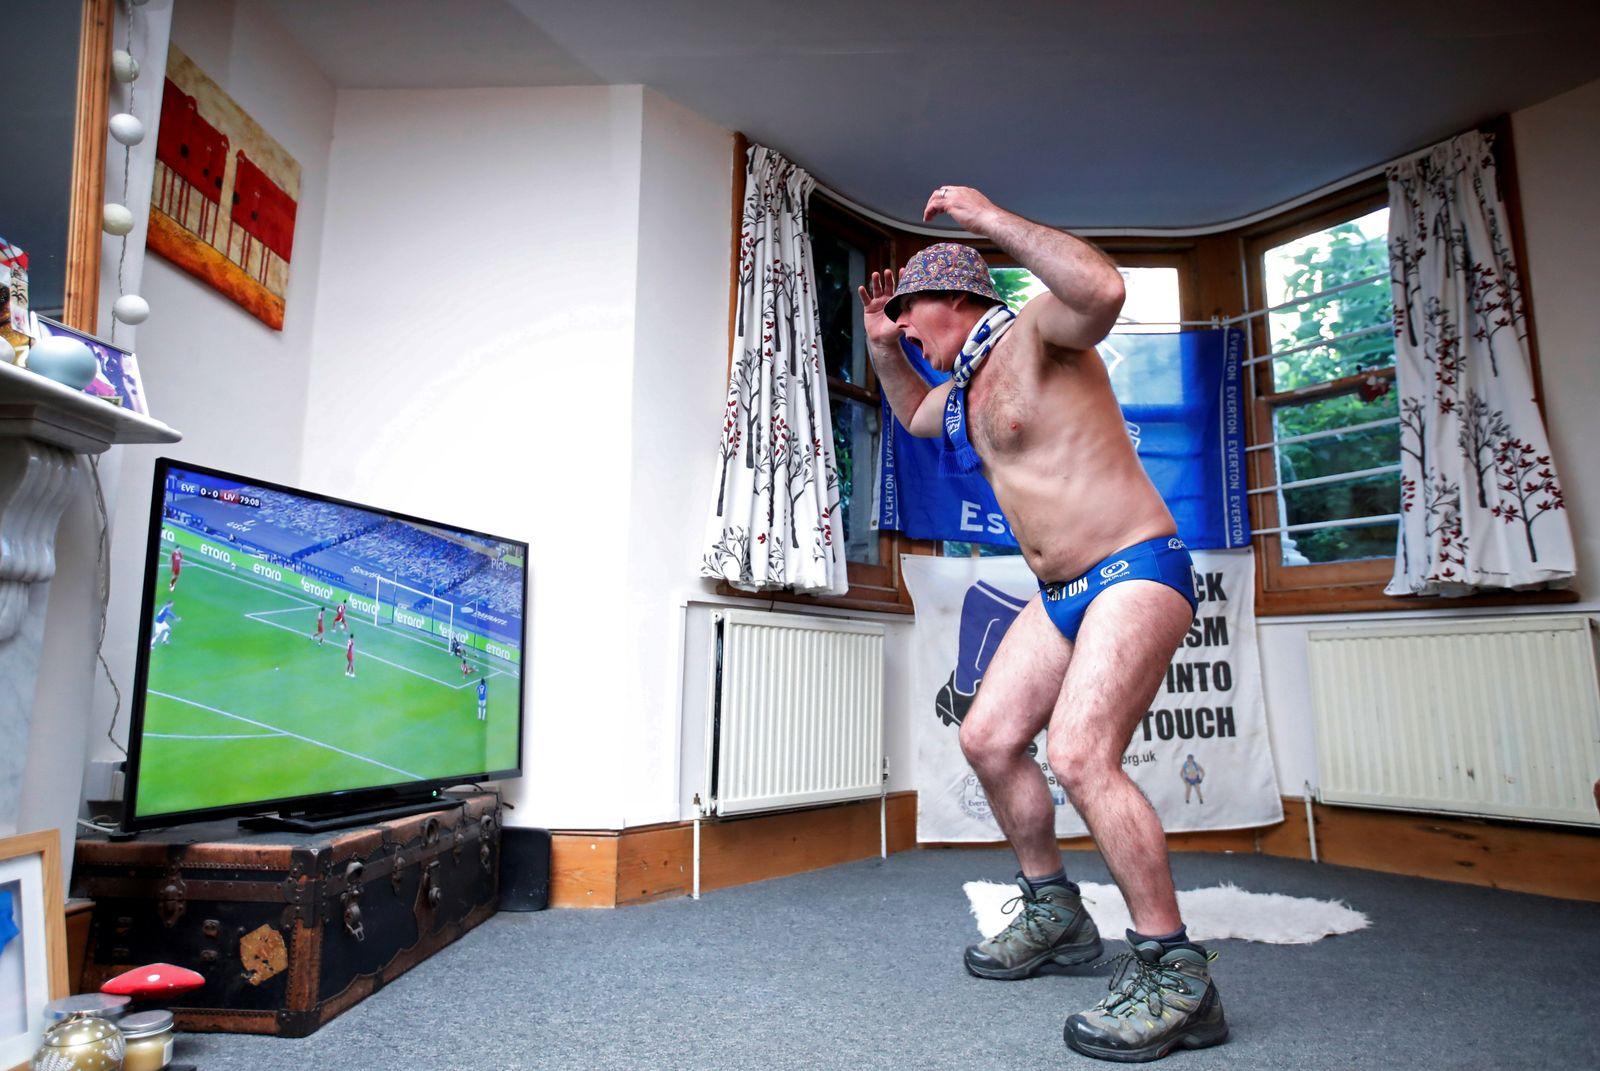 Fans watch the return of the Premier League - Everton v Liverpool